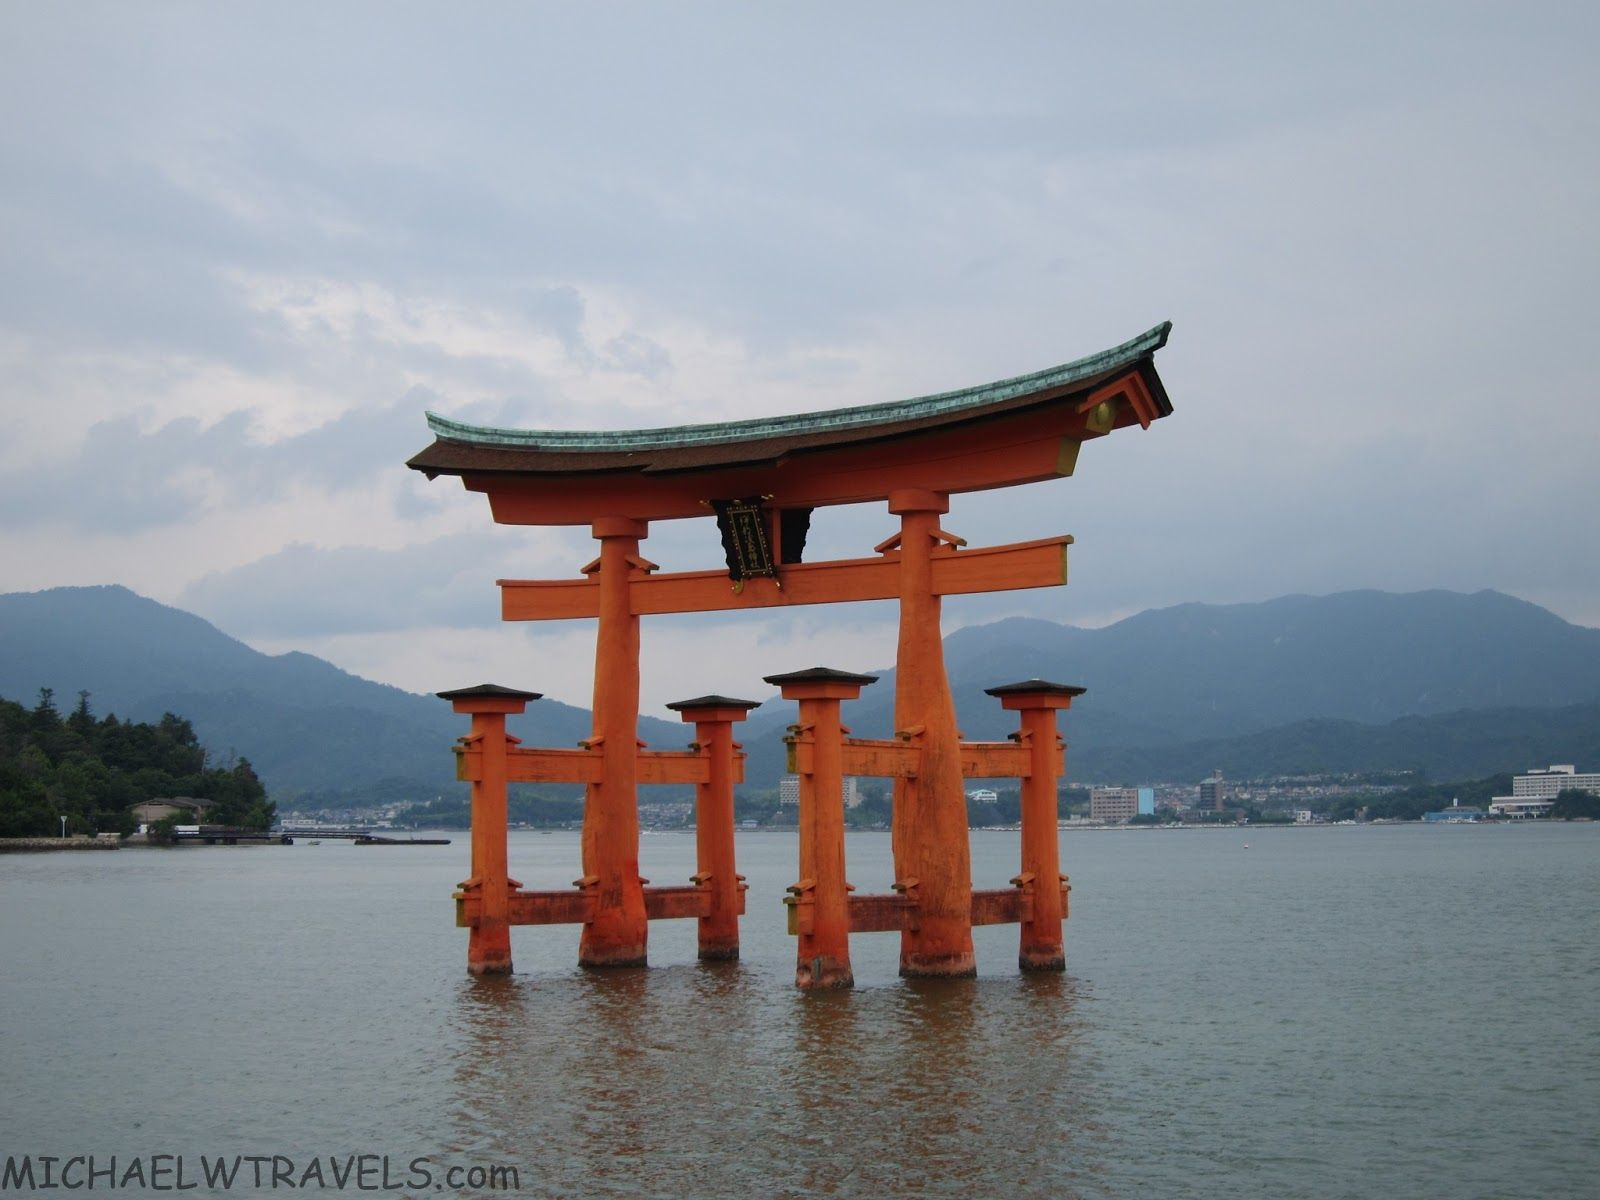 Japan Wallpapers Wallpaper Photograph Japan travel Travel 1600x1200